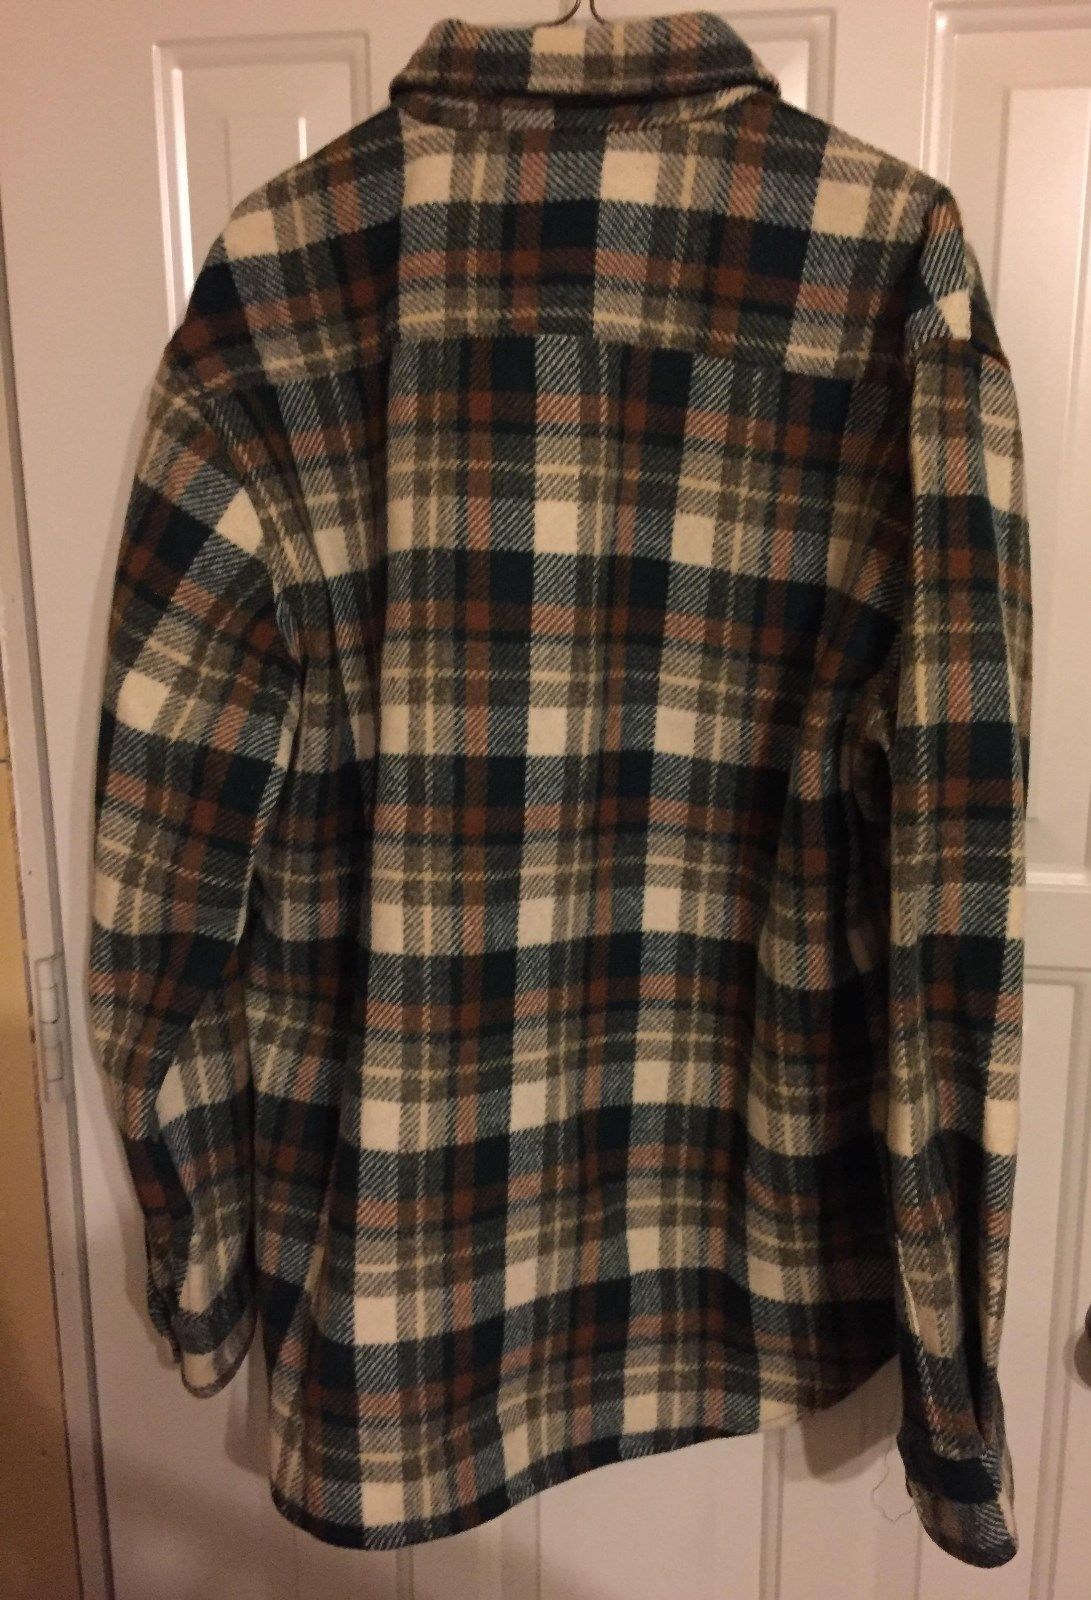 Vintage 1980's Sears Green Plaid Wool Jacket - Size 42 mOHJ3zj